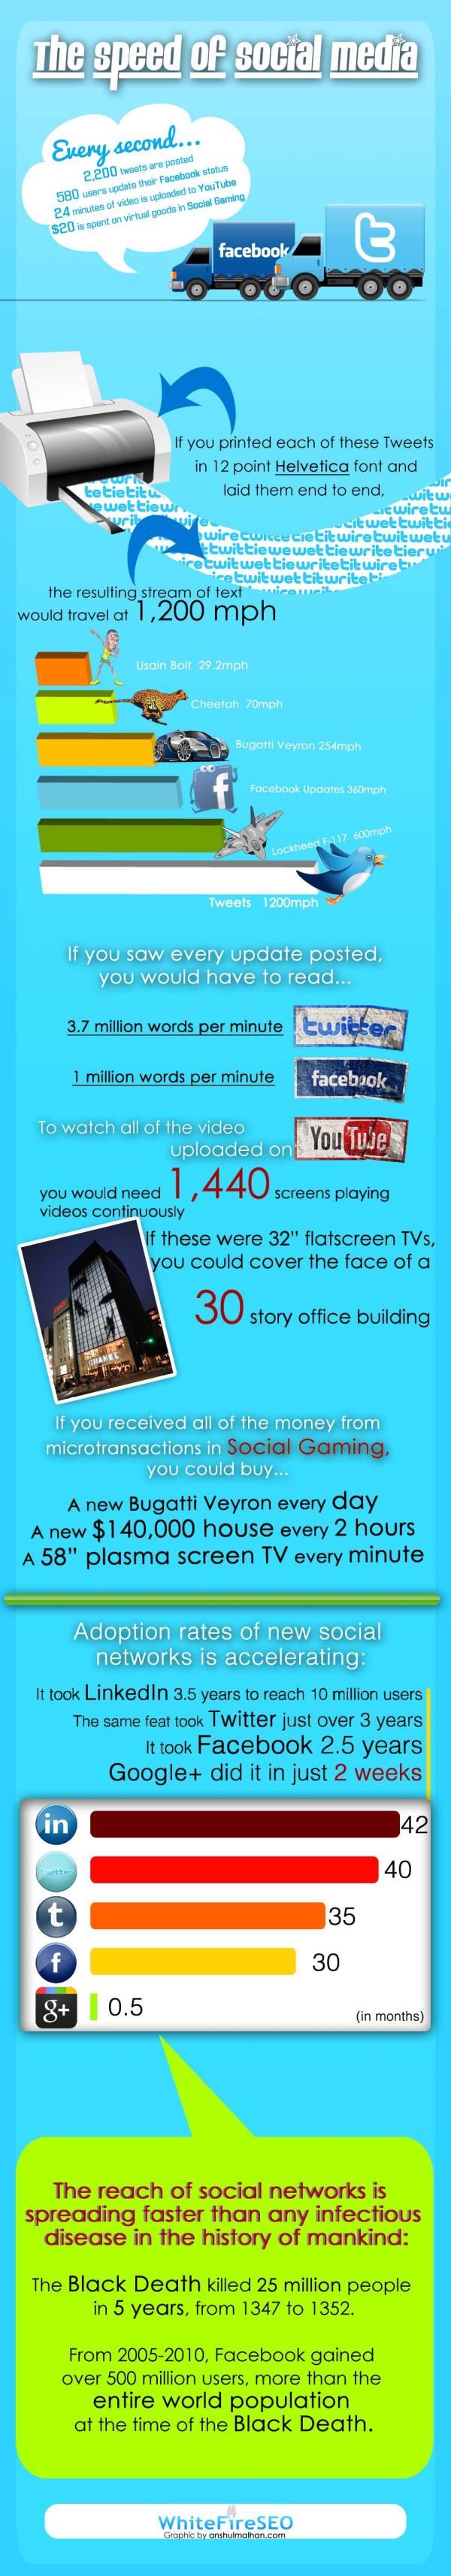 Social Media Speed resized 600